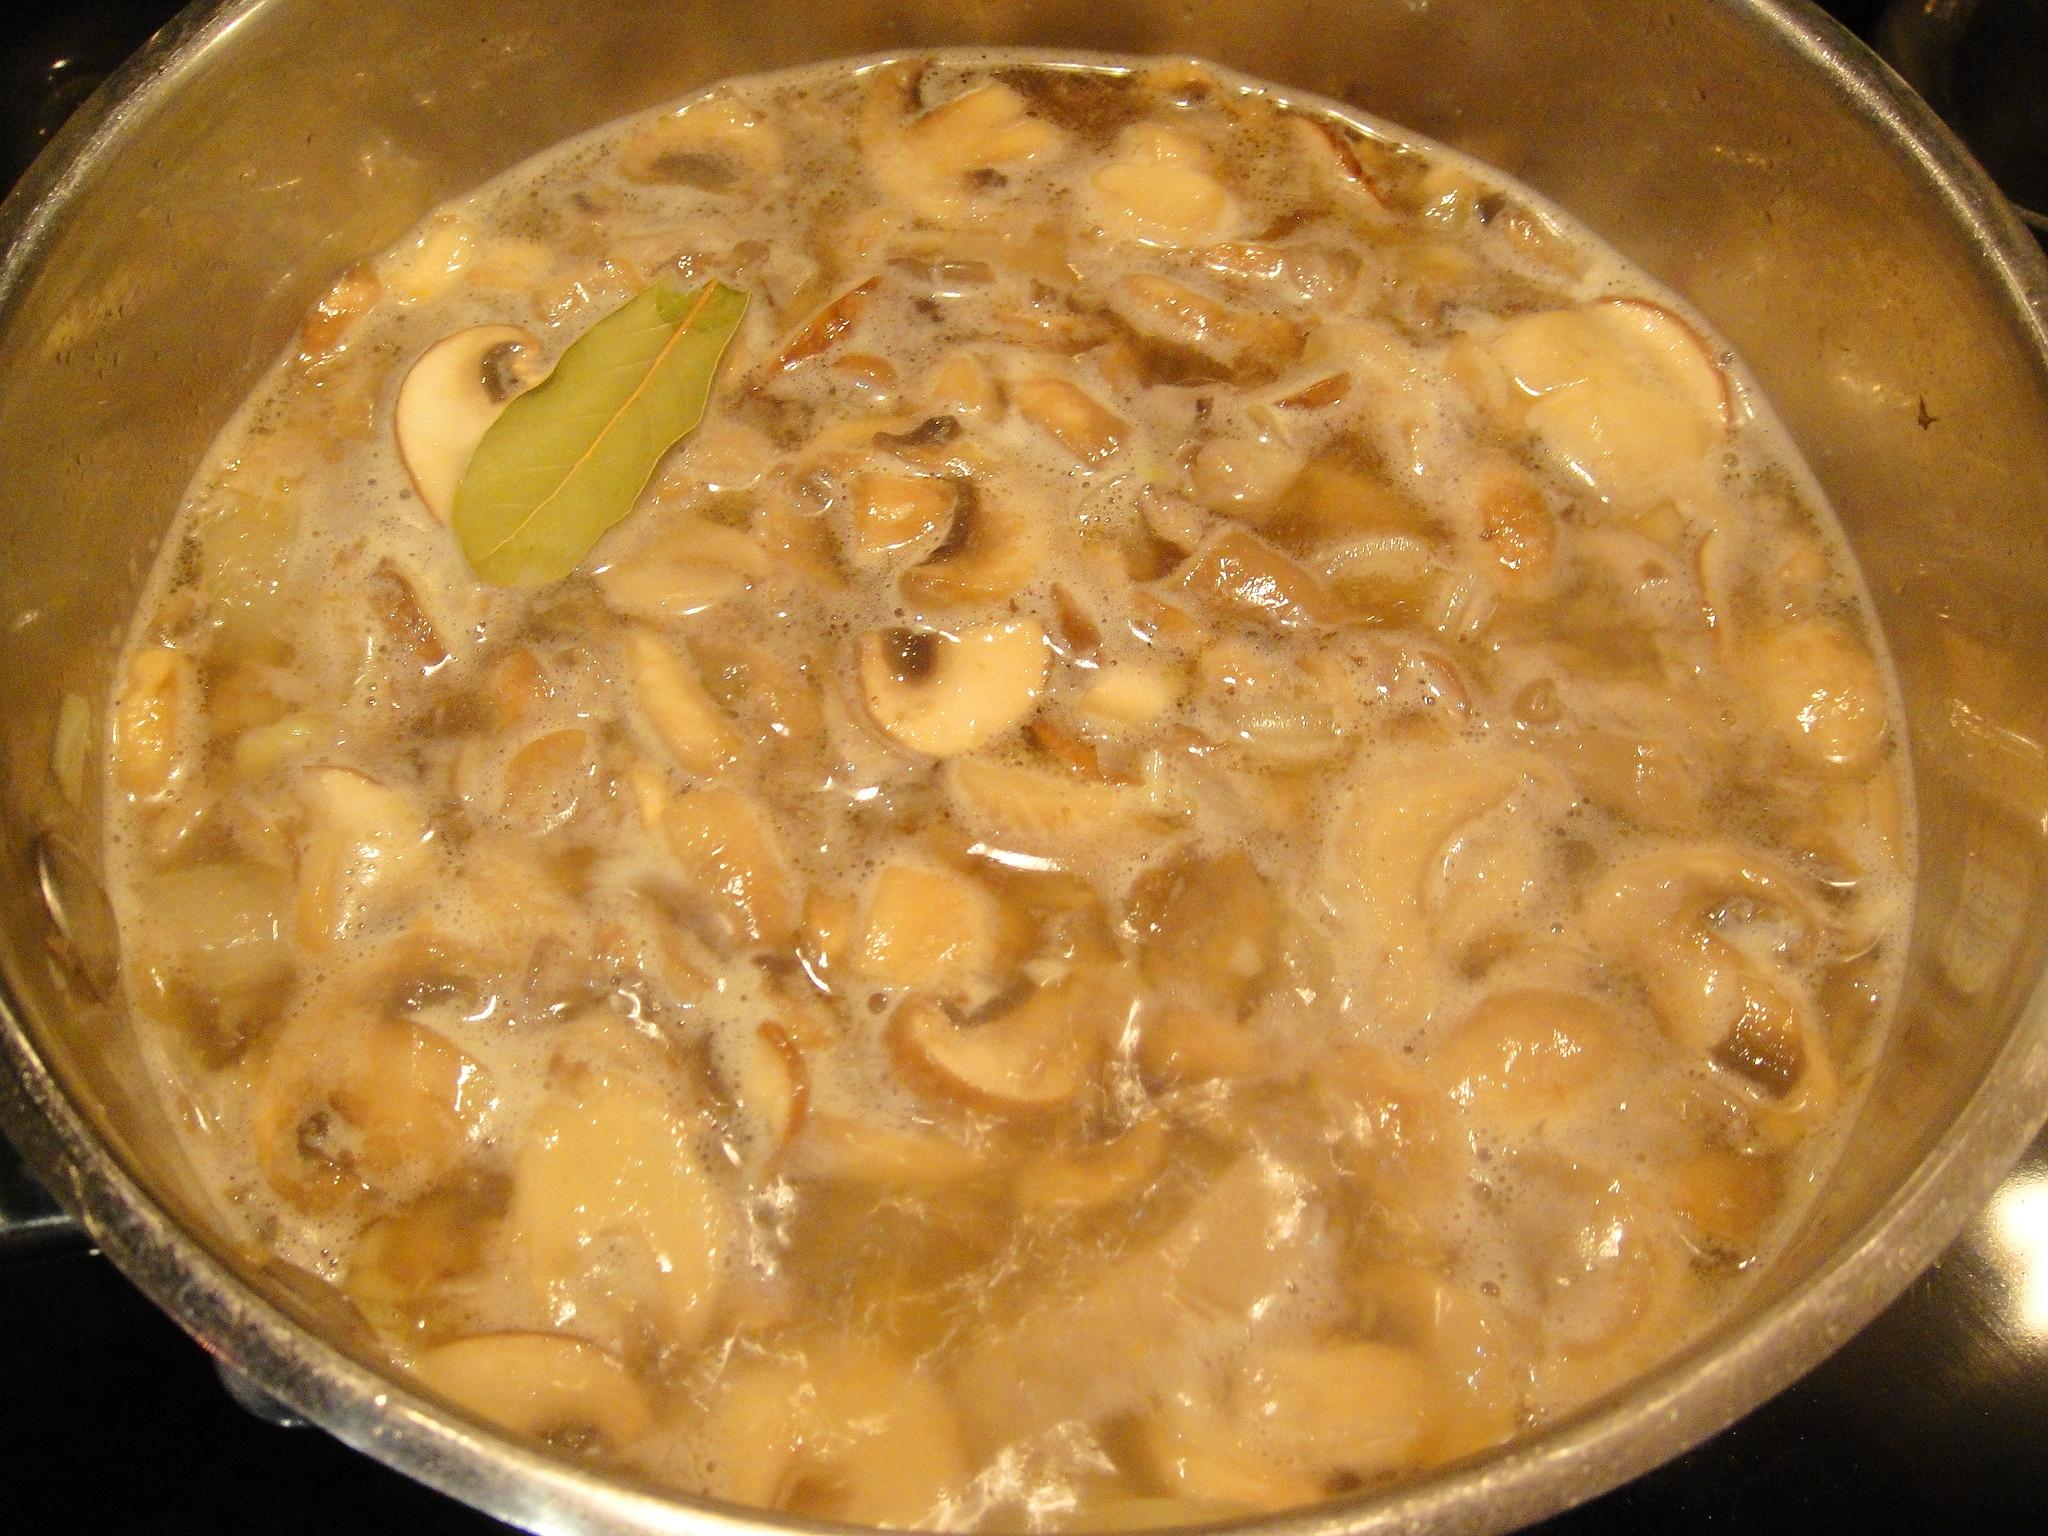 mushroom soup boiling